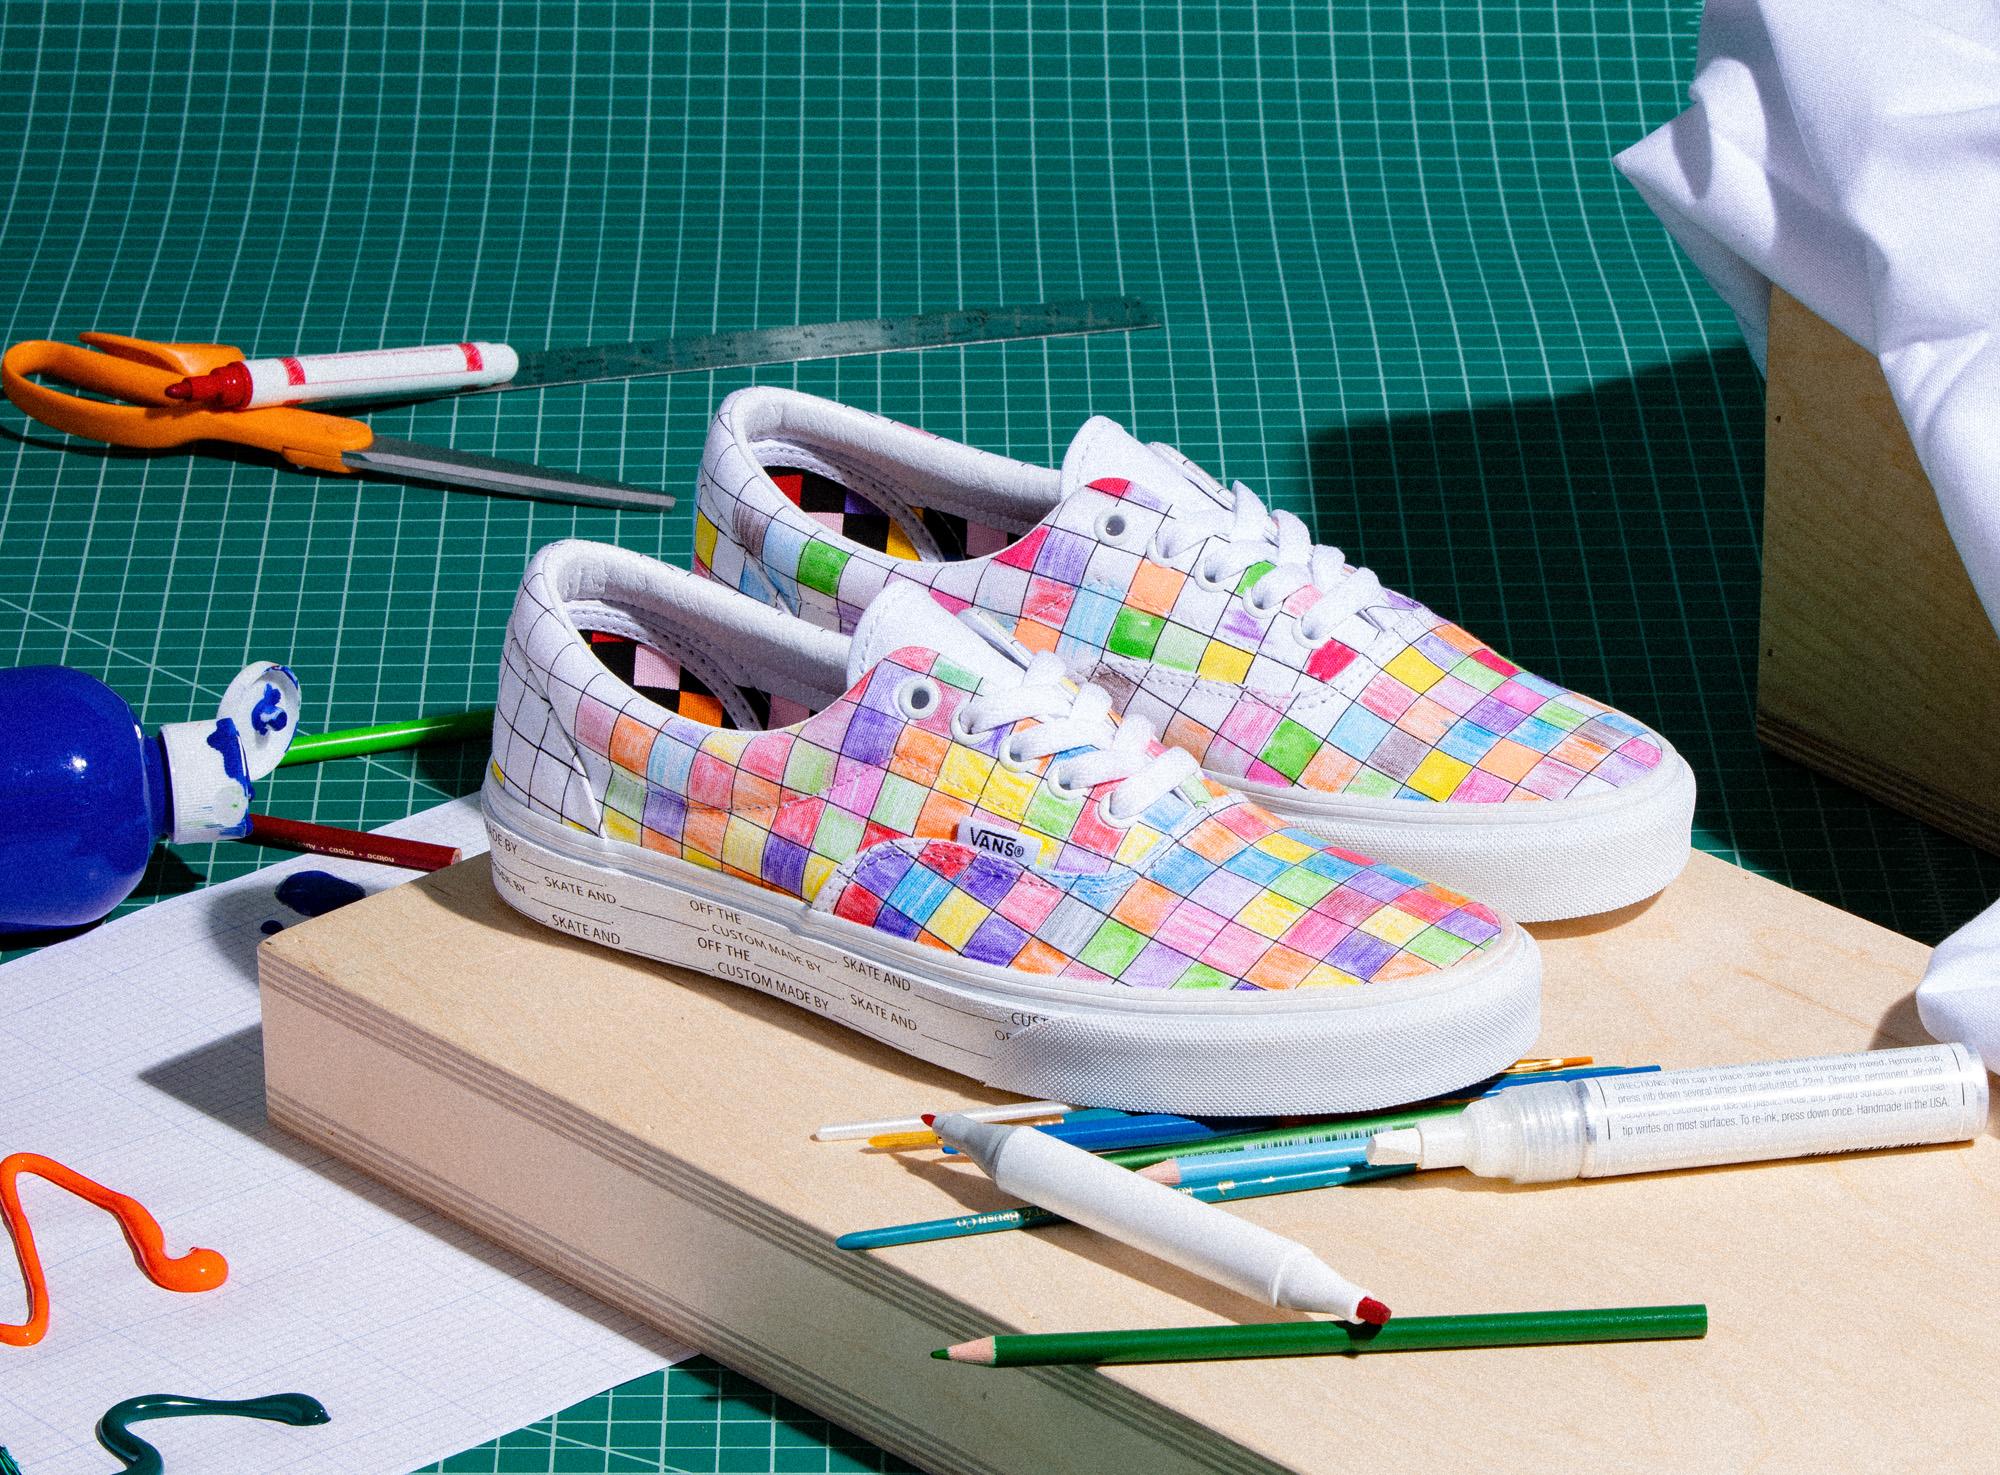 Vans Sparks Creativity with U-Color